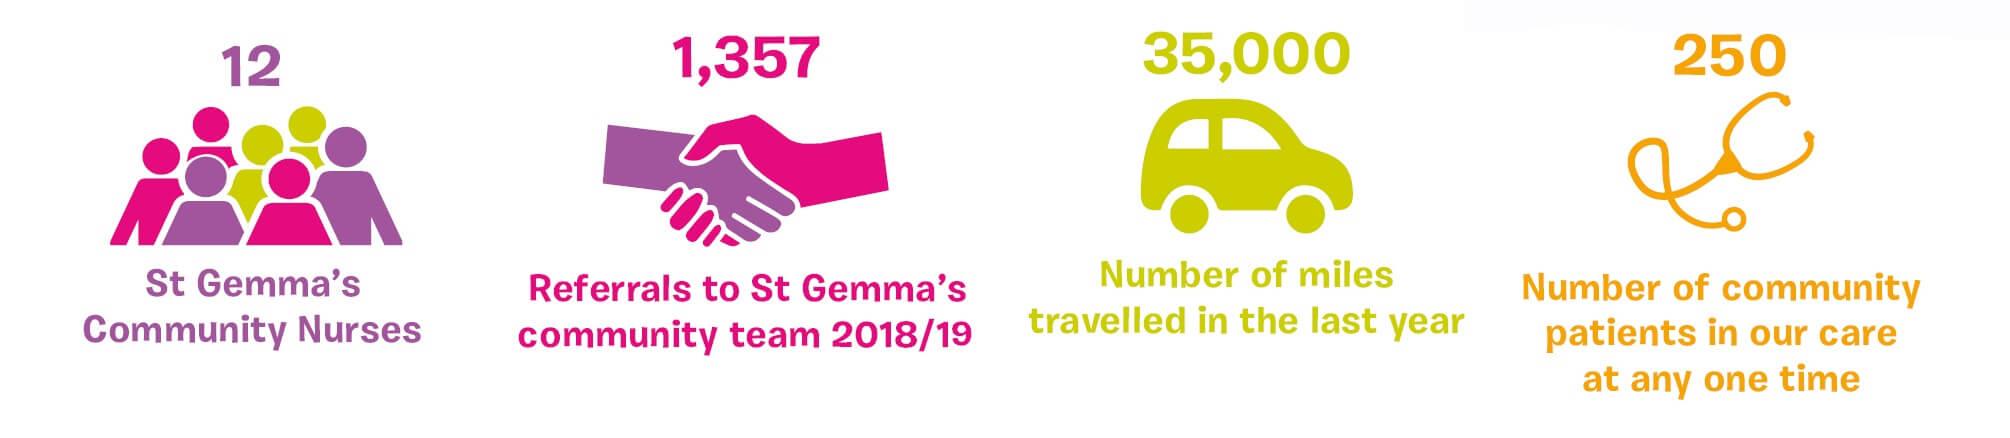 Community Nurses Stats 2018-19